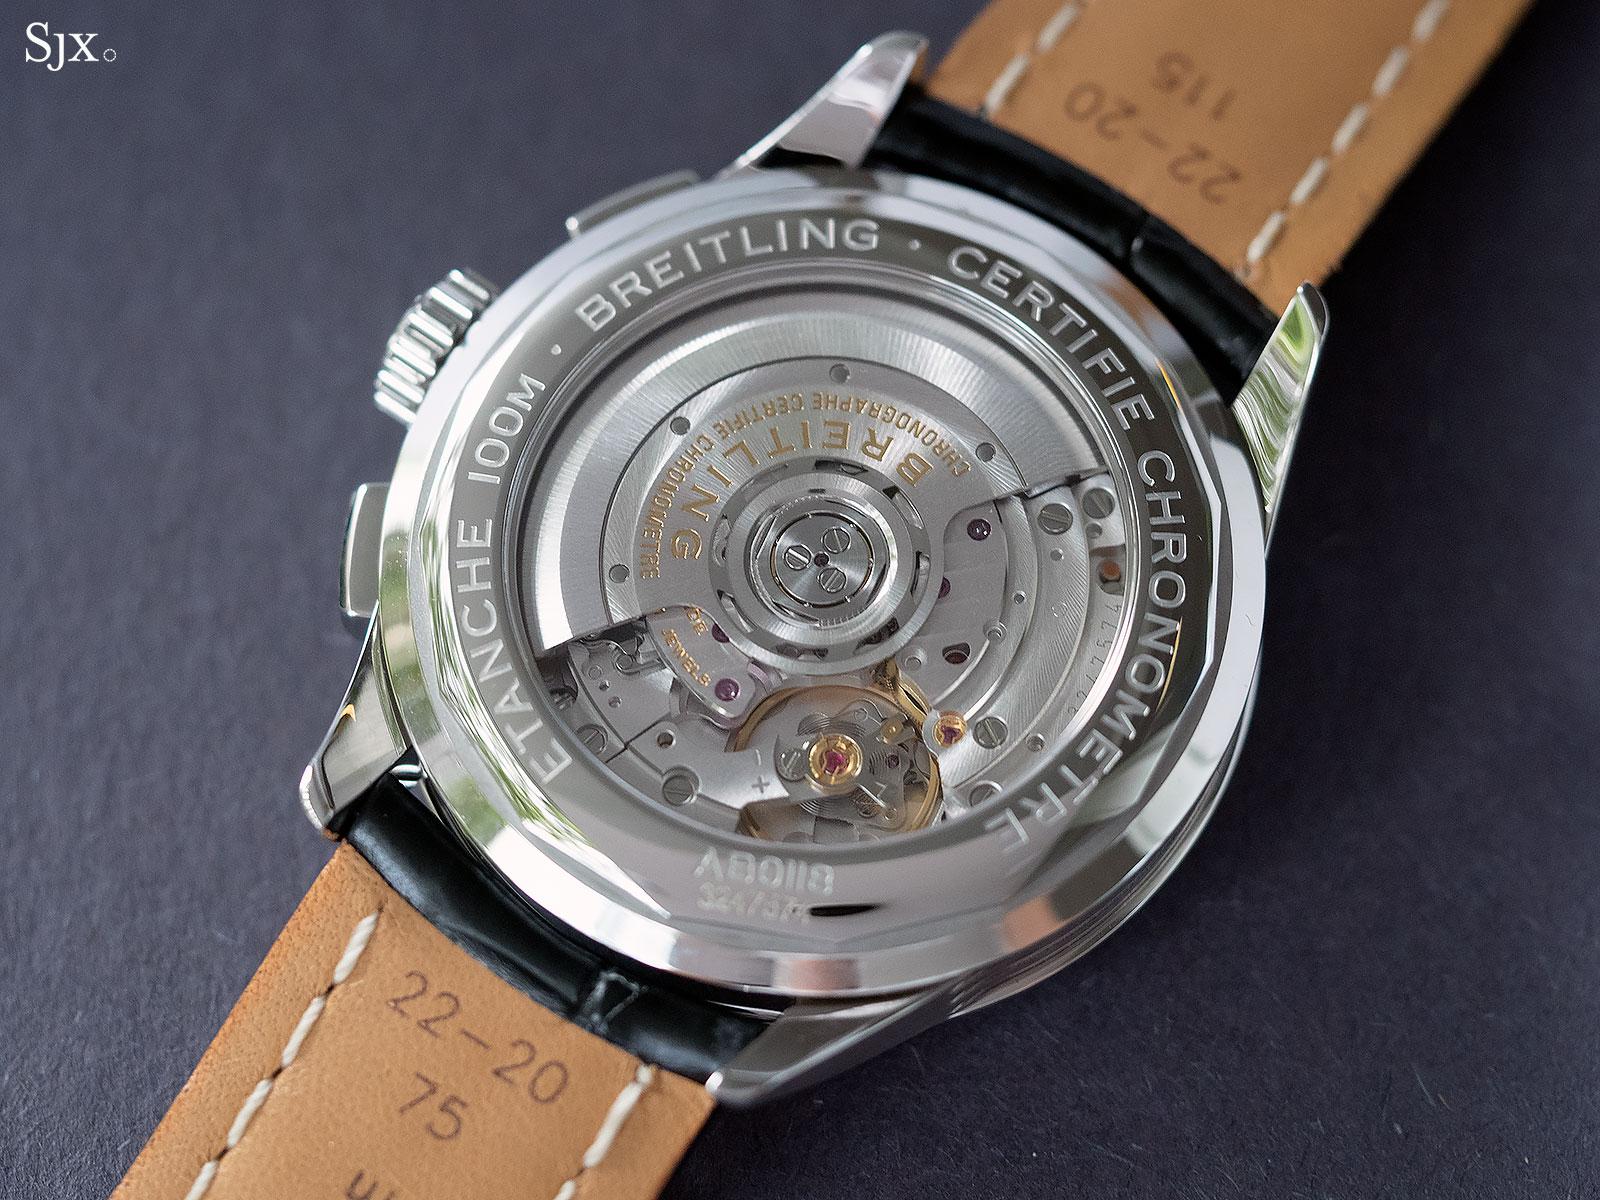 Breitling Premier B01 movement 1